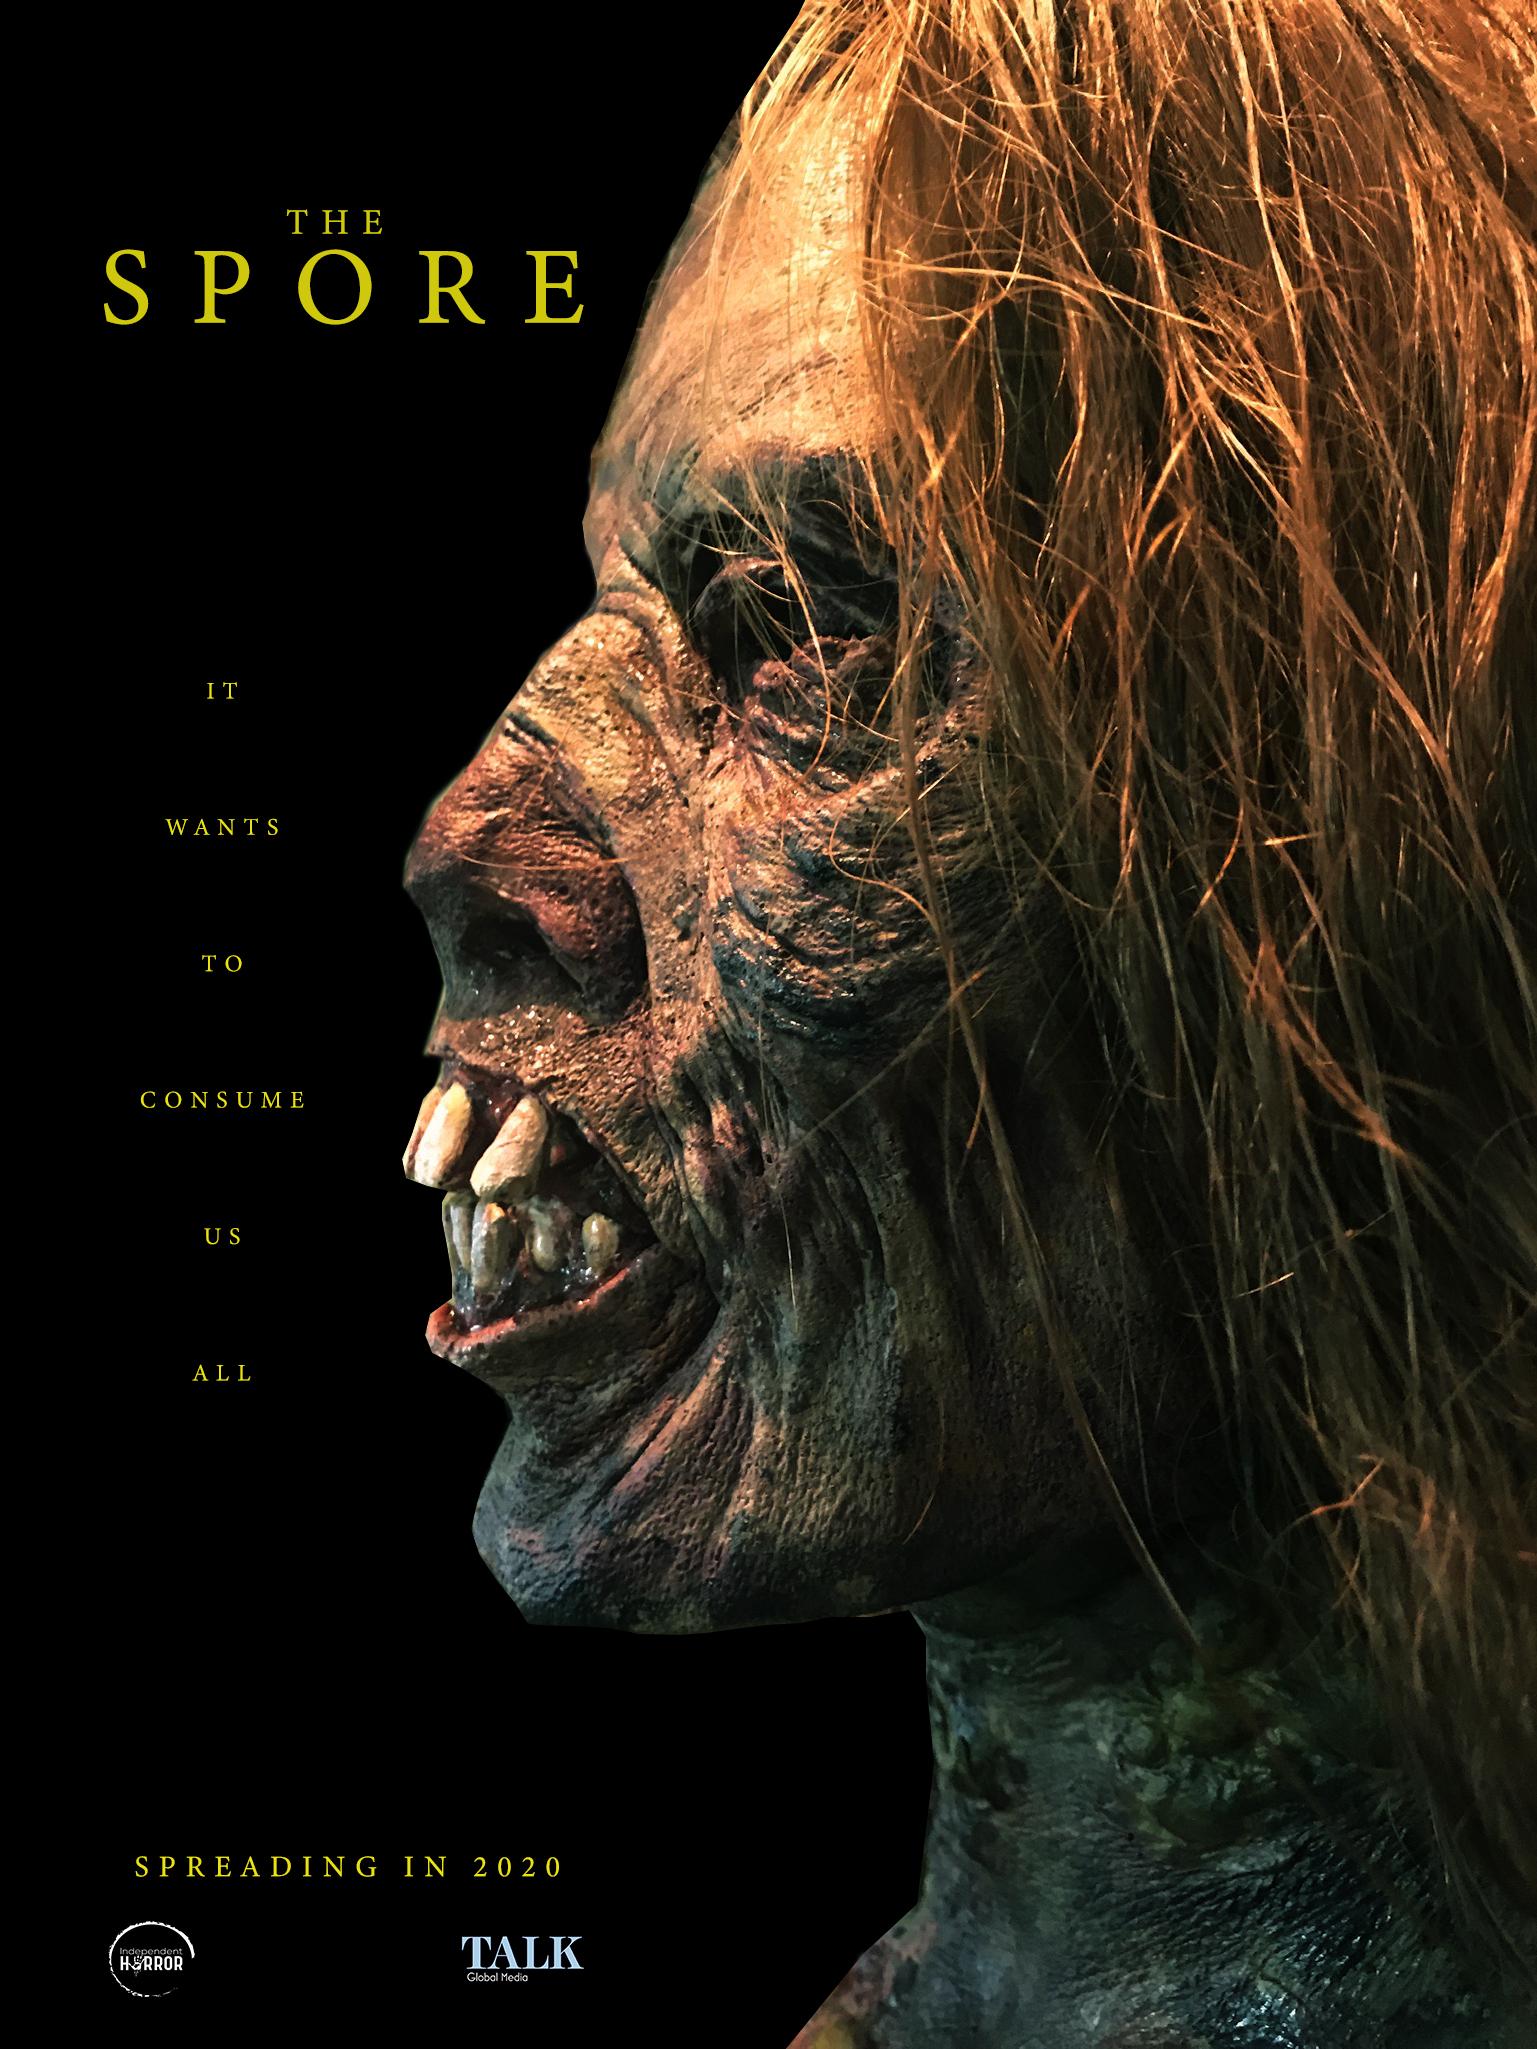 The Spore - IMDb